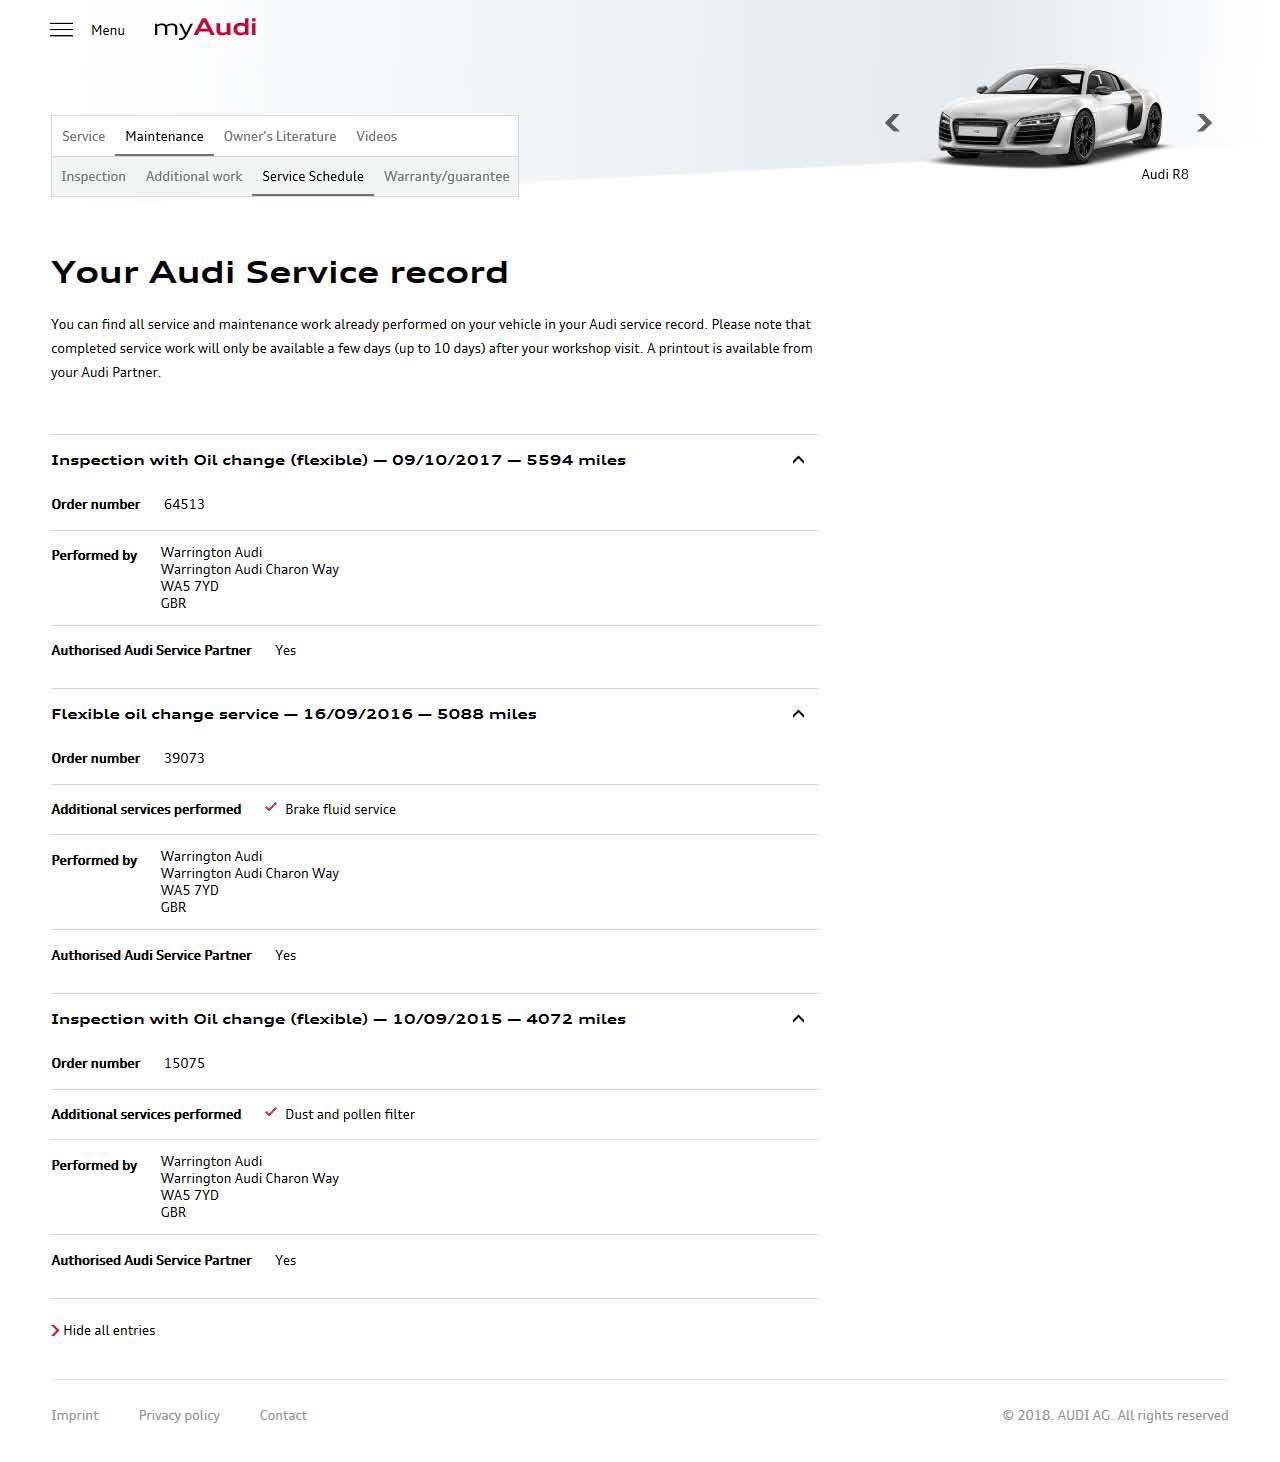 My Audi Electronic Service Schedule - Audi maintenance schedule